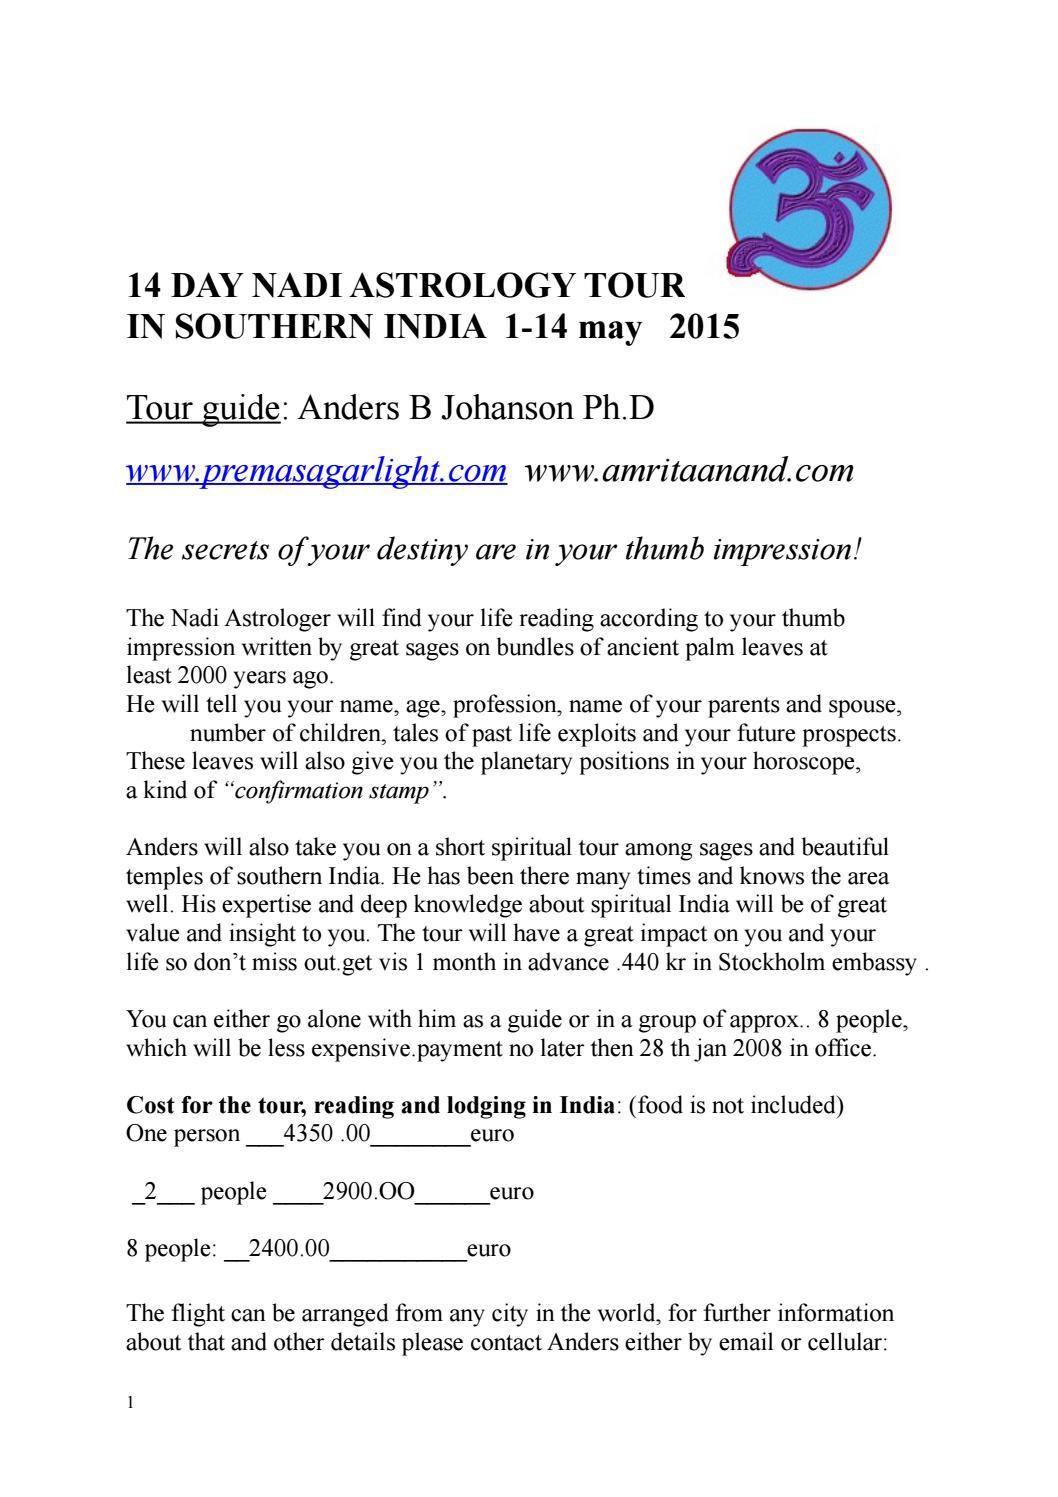 Nadi astrology tour to india1 2017-2018 by premasagarr light